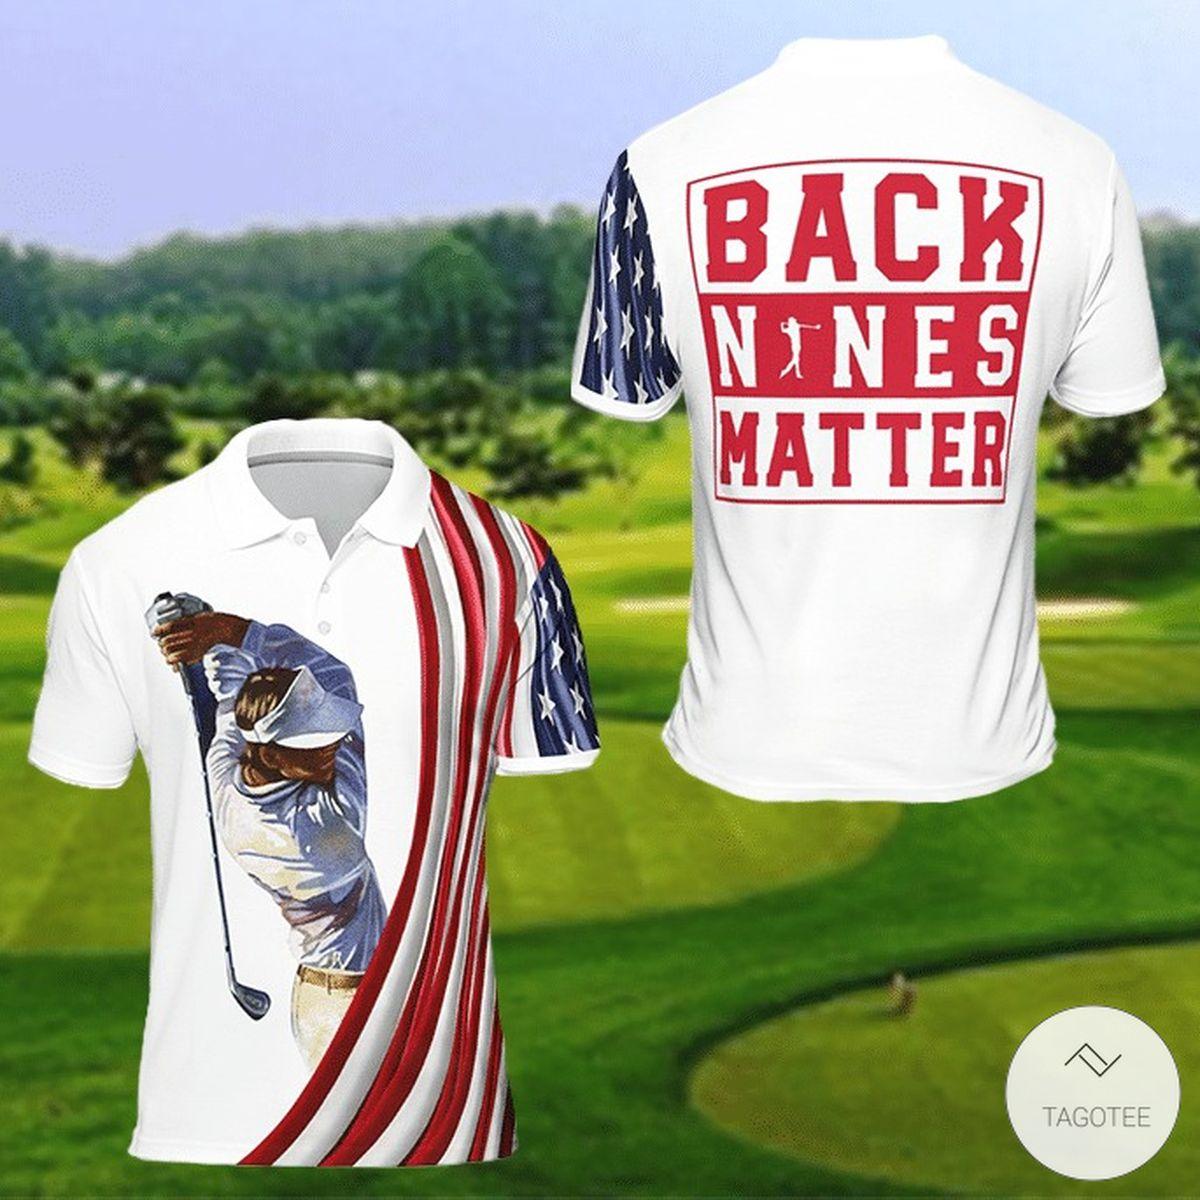 Back Nines Matter Golf Polo Shirt